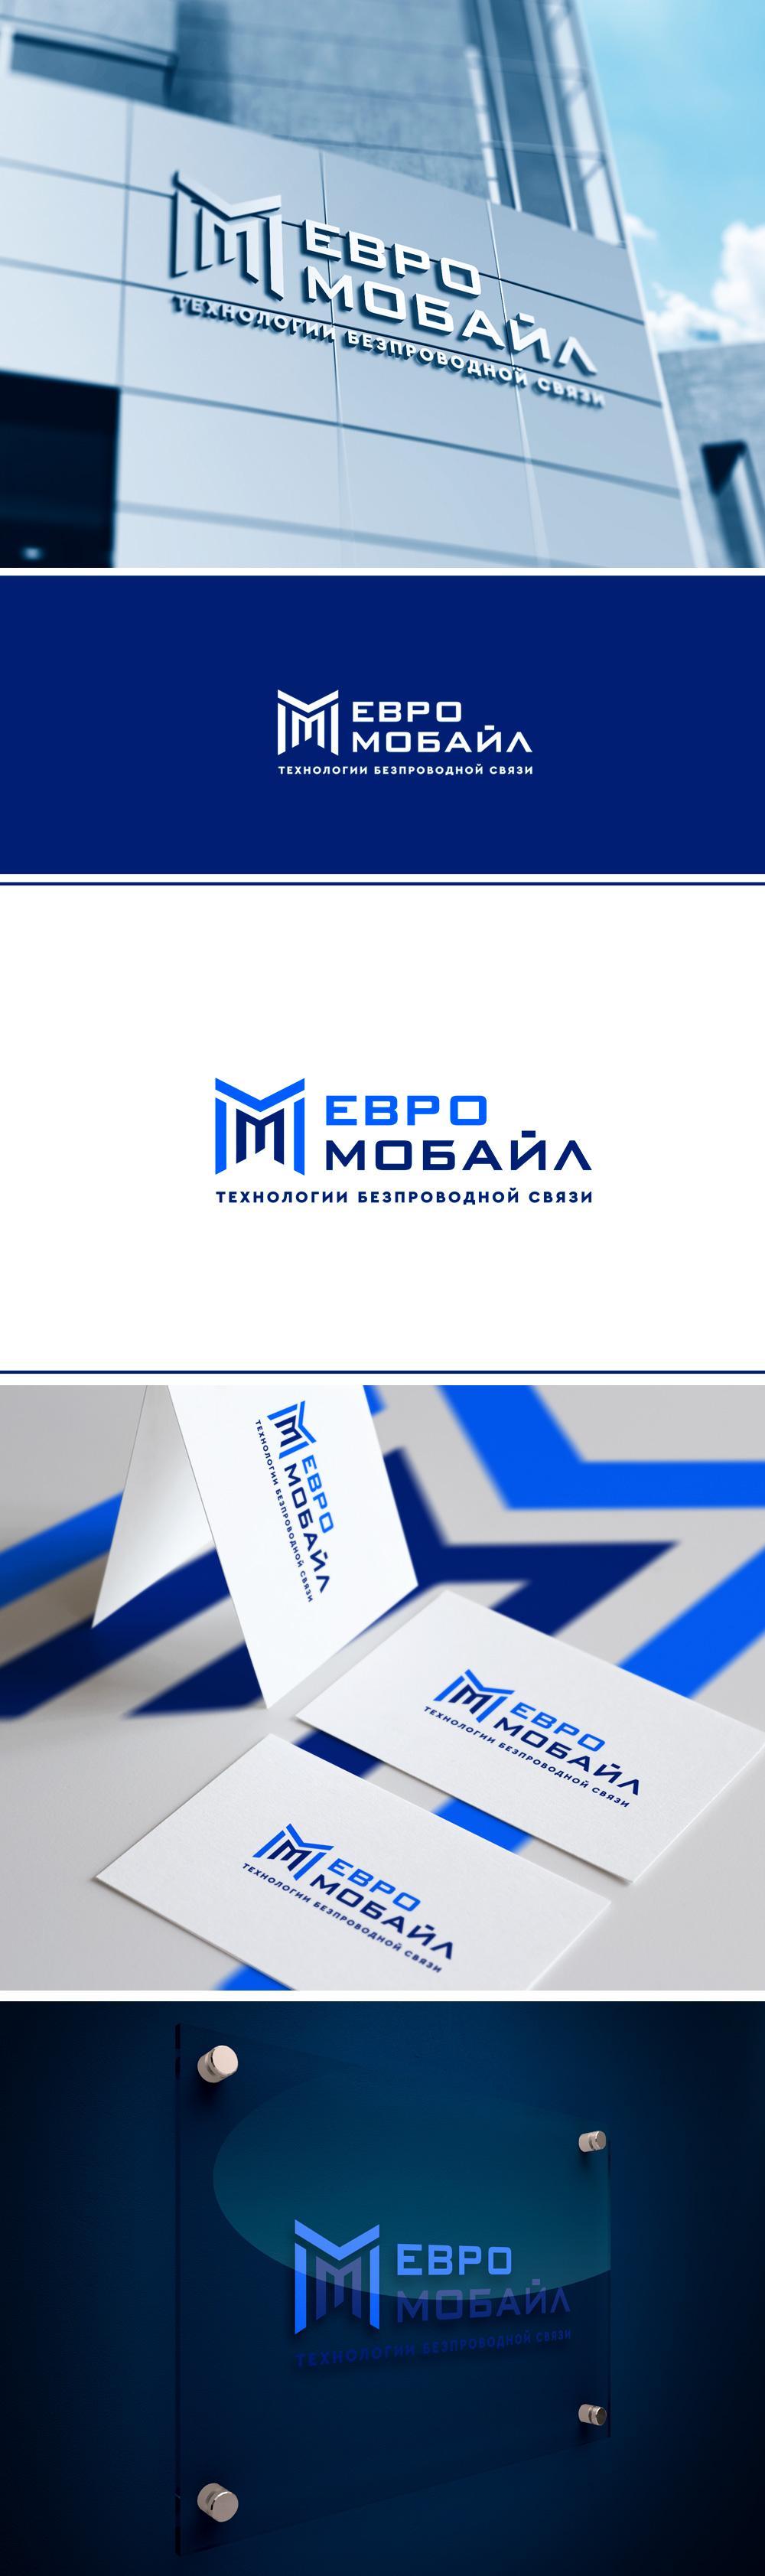 Редизайн логотипа фото f_69059bfafca06fc8.jpg